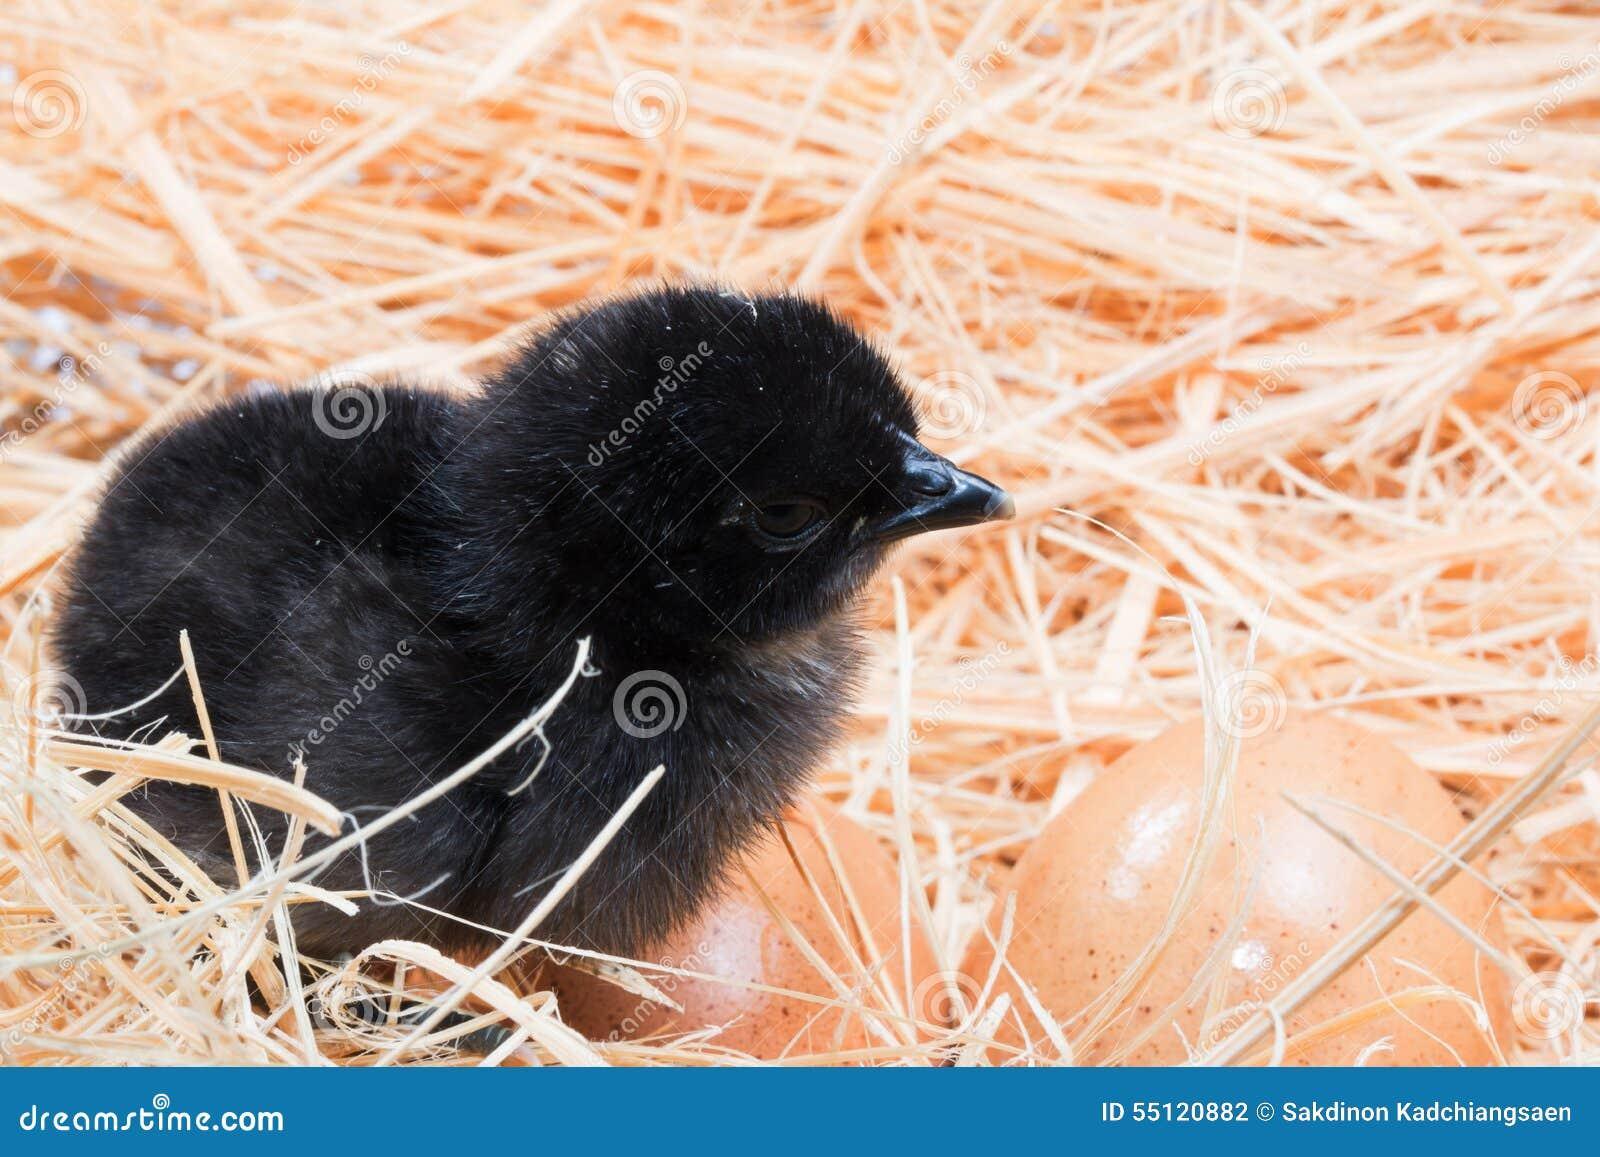 Helpless Chicks